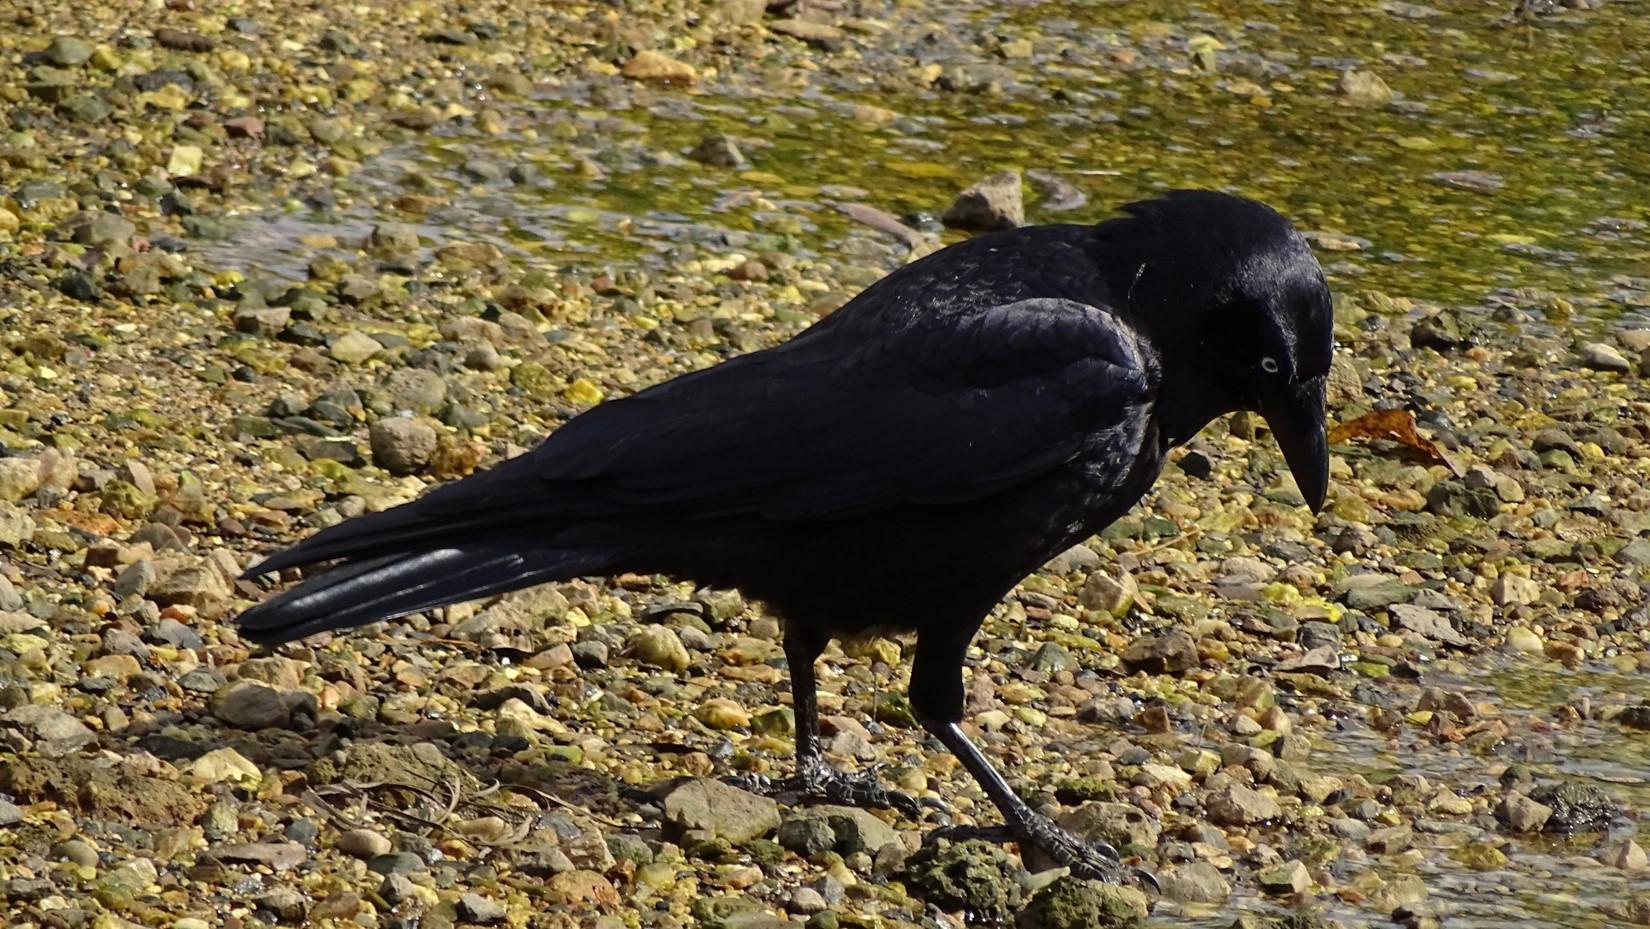 Adult Torresian Crow